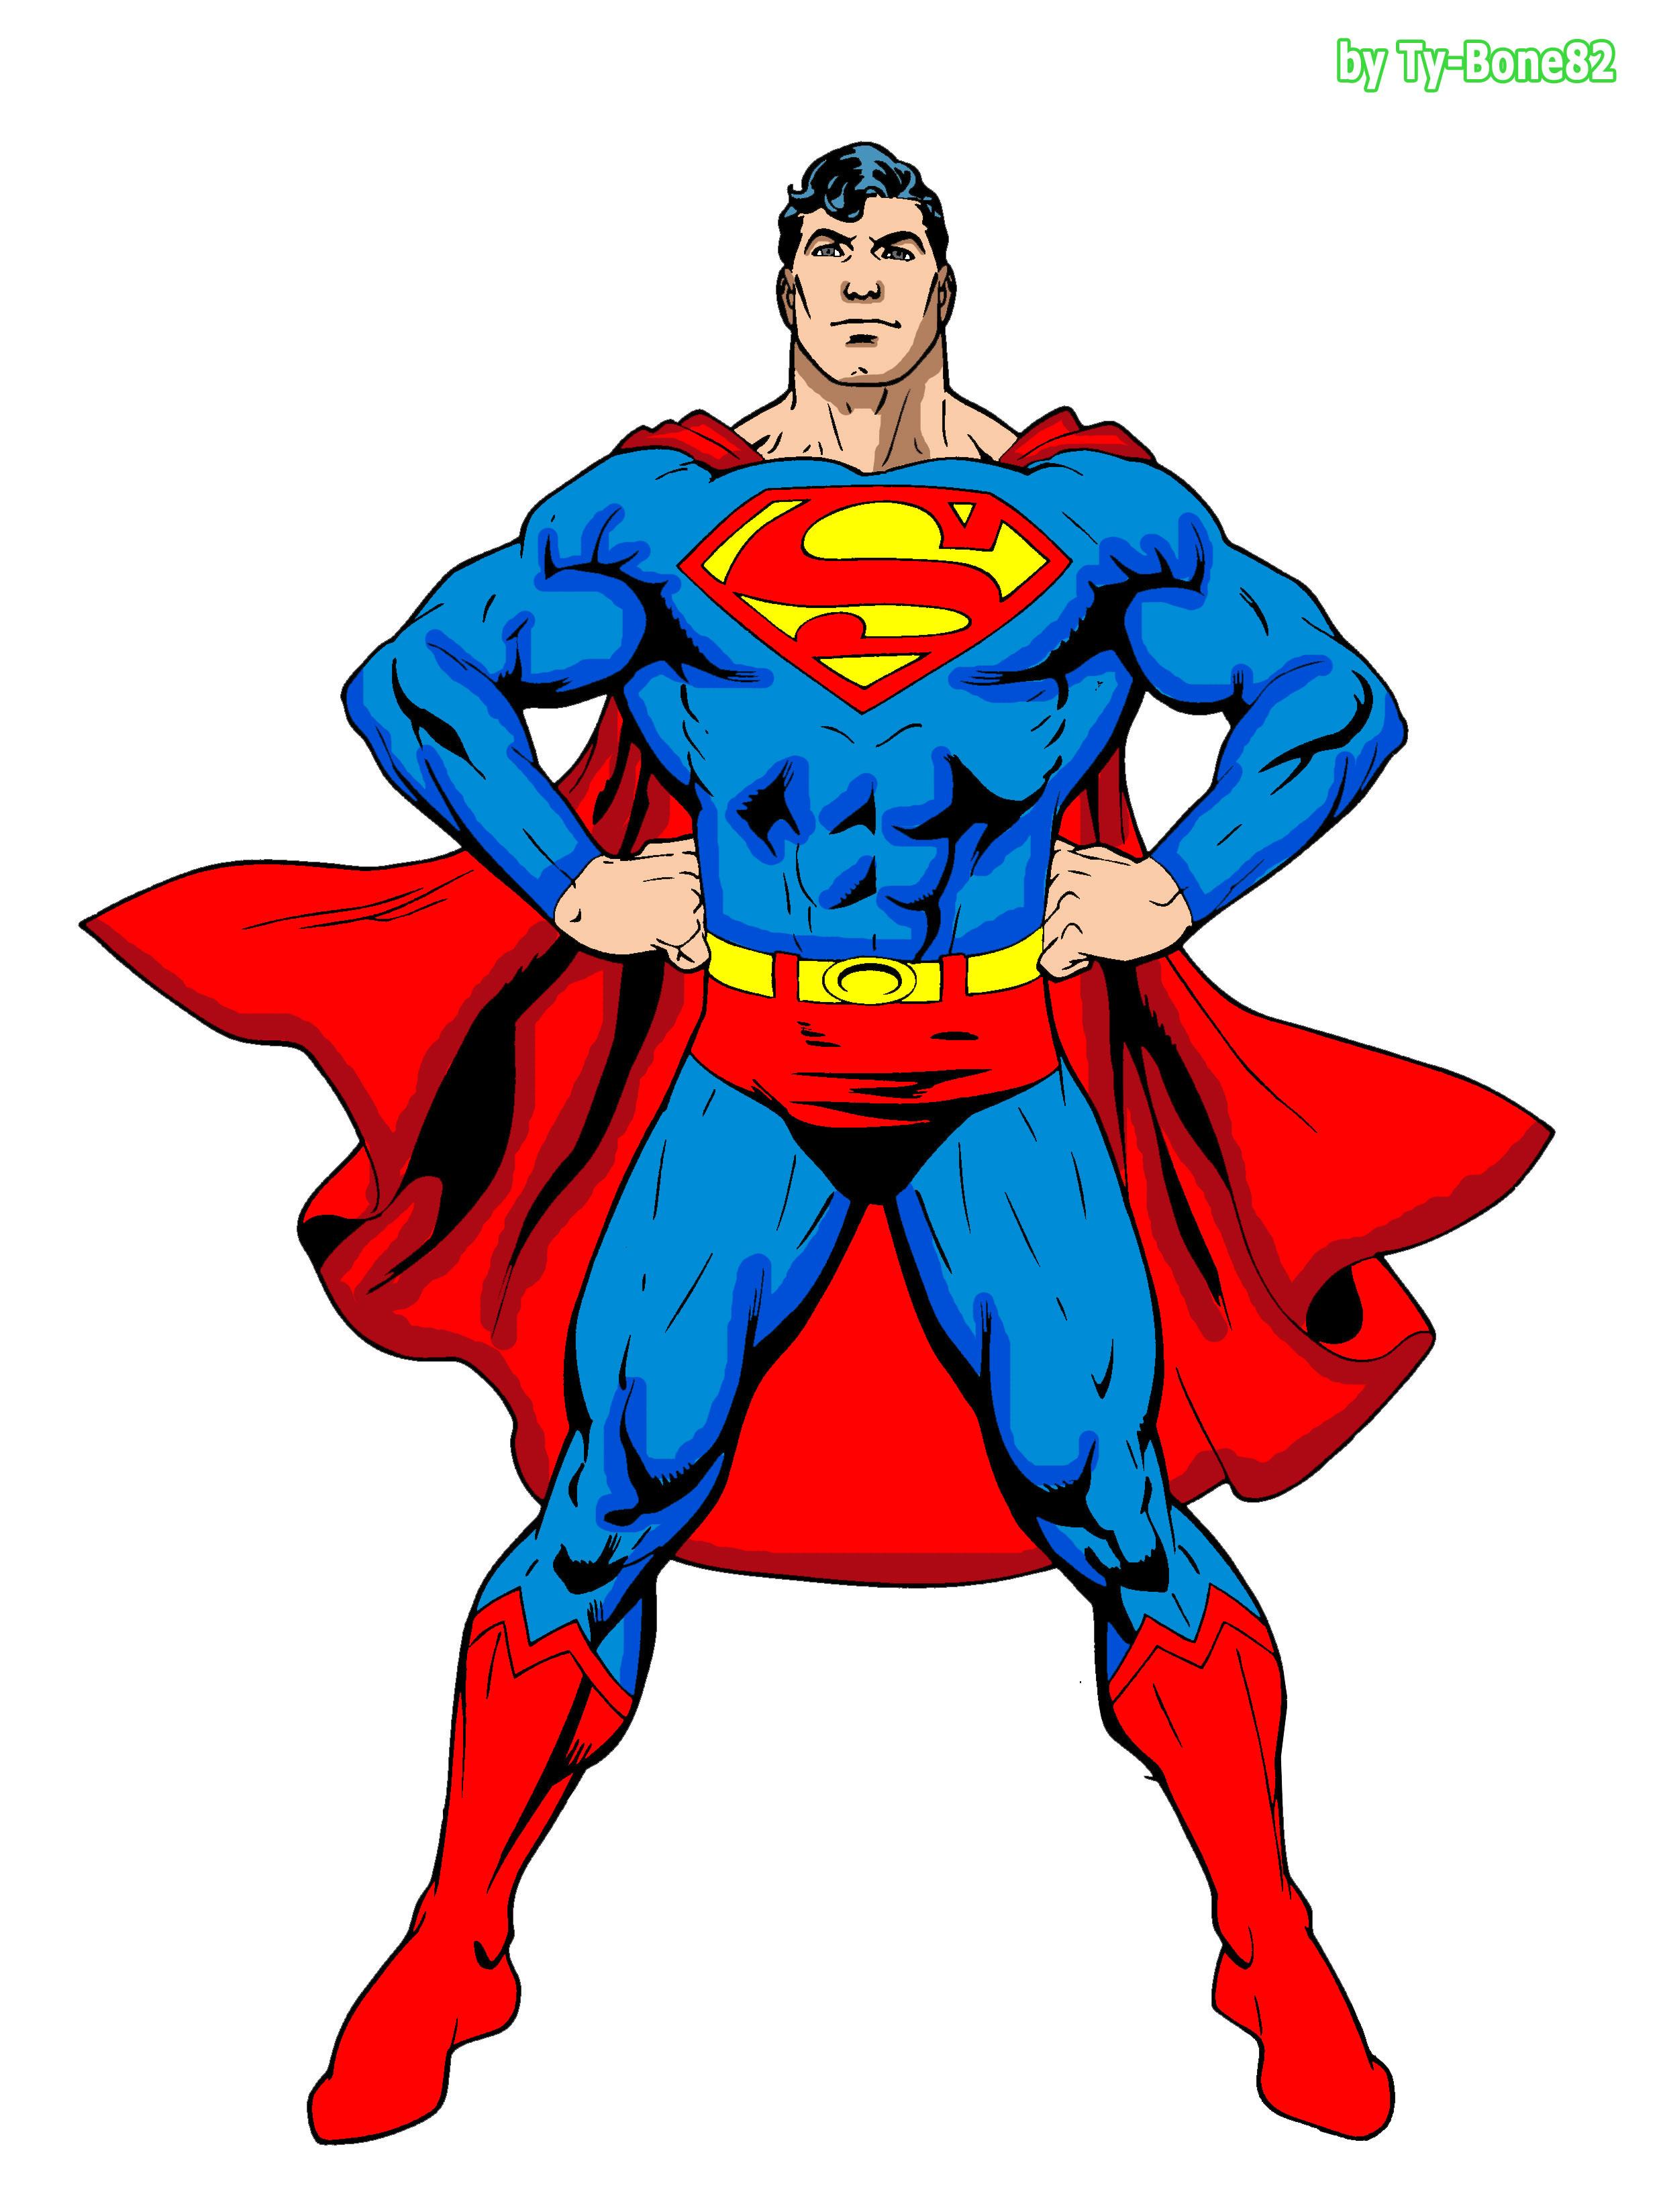 Superman Final Color By Super TyBone82 On DeviantArt